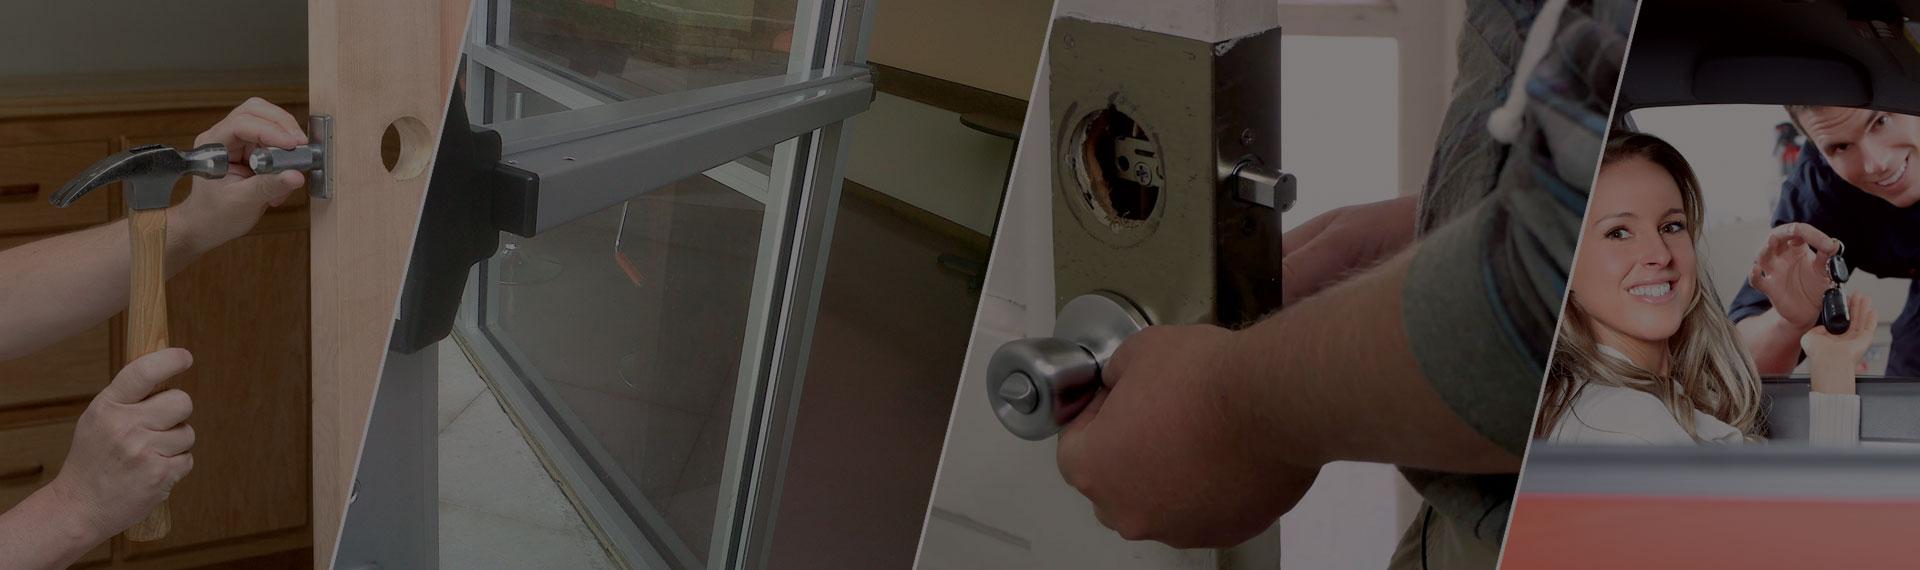 Apple Valley Locksmith Services MN